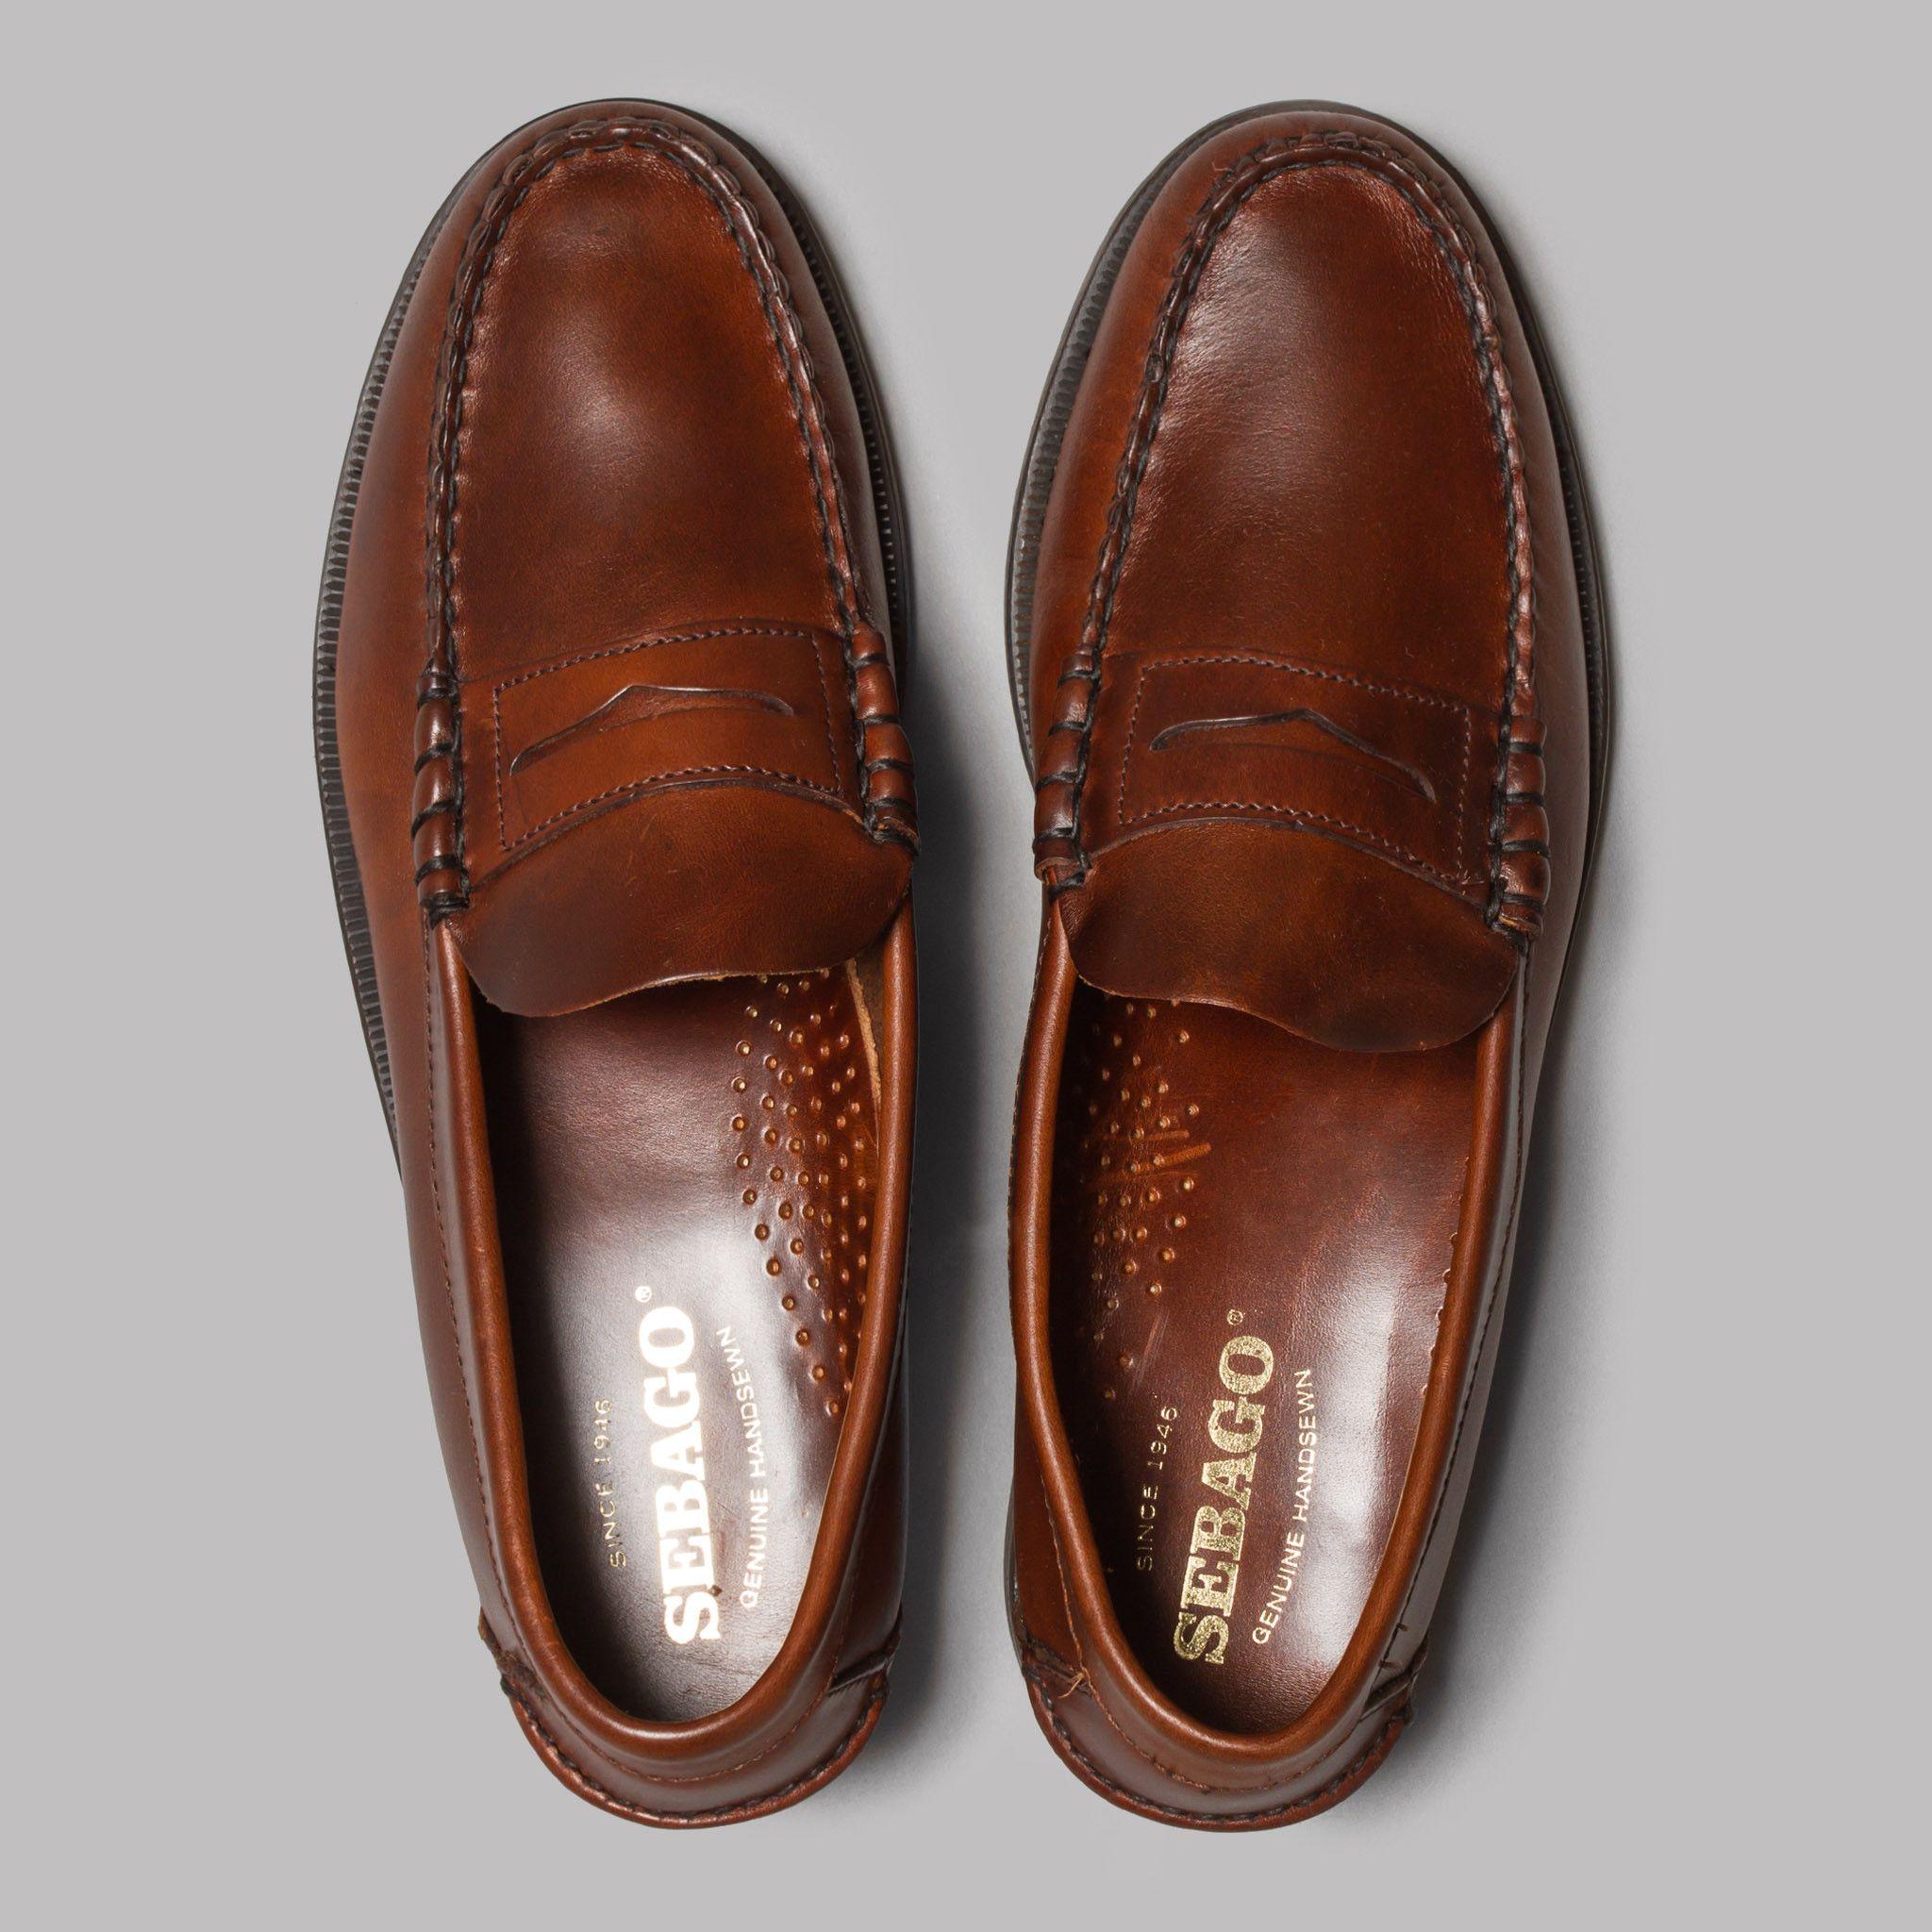 Sebago Classic (Brown Oiled Waxy)